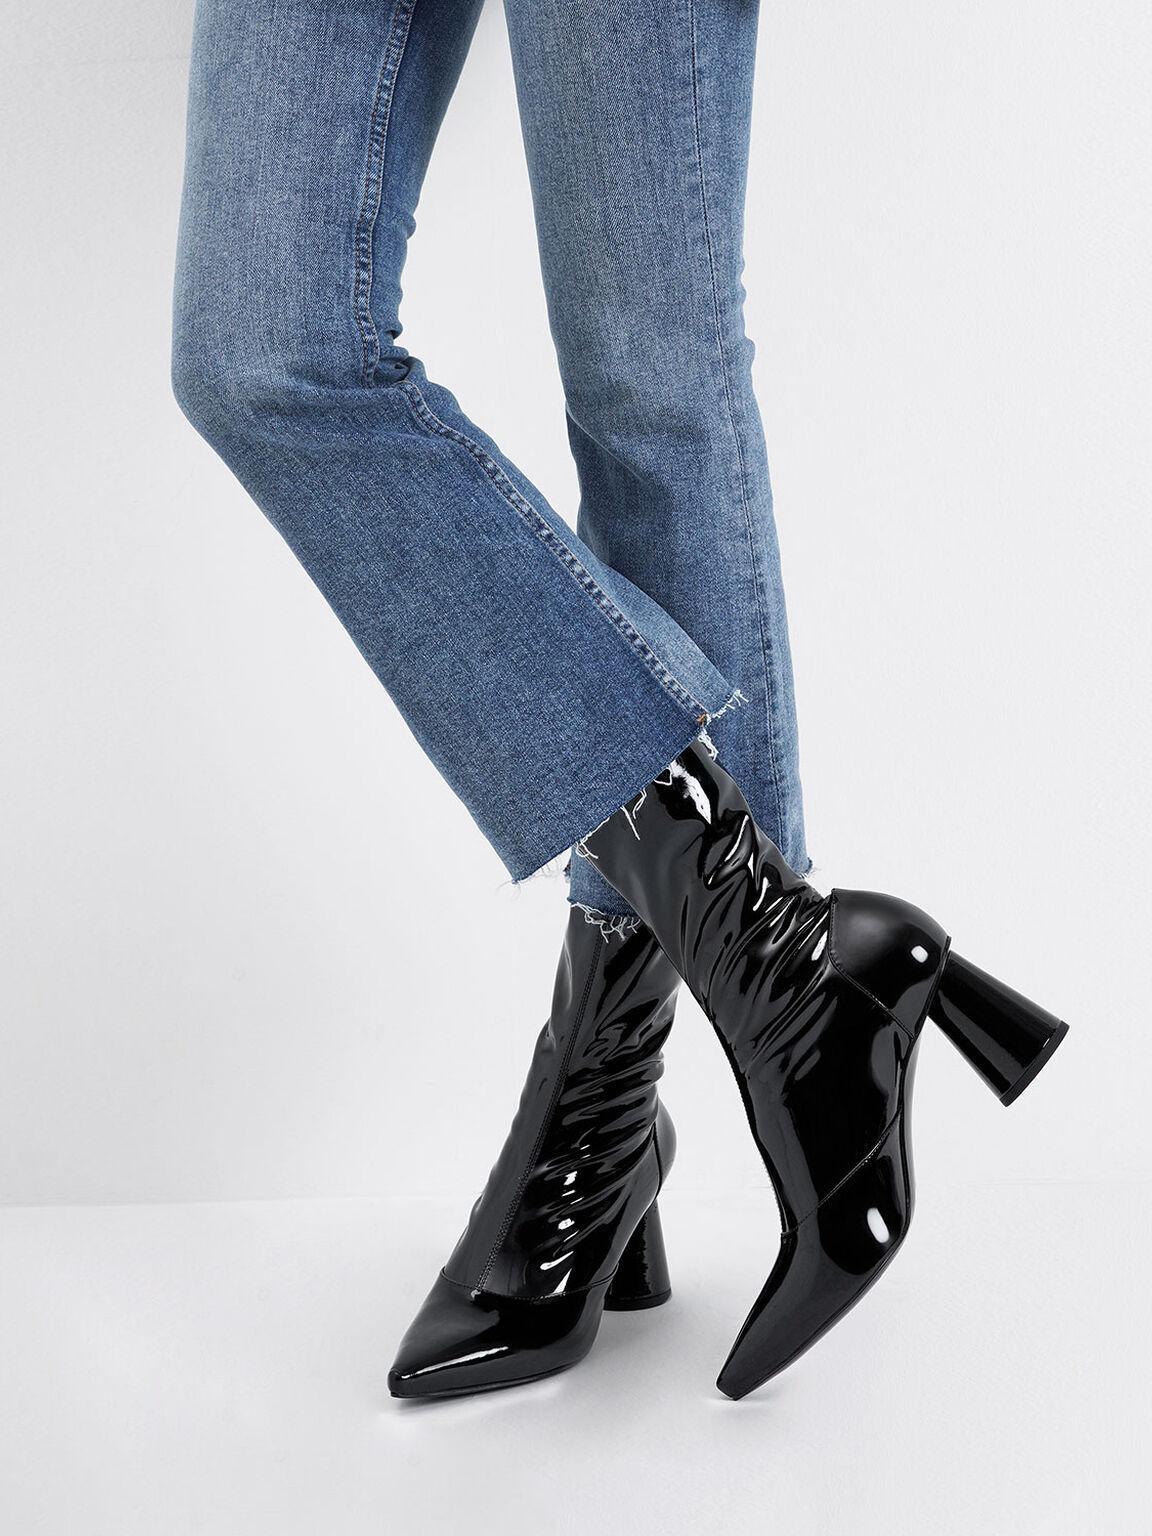 Patent Cylindrical Heel Calf Boots, Black, hi-res